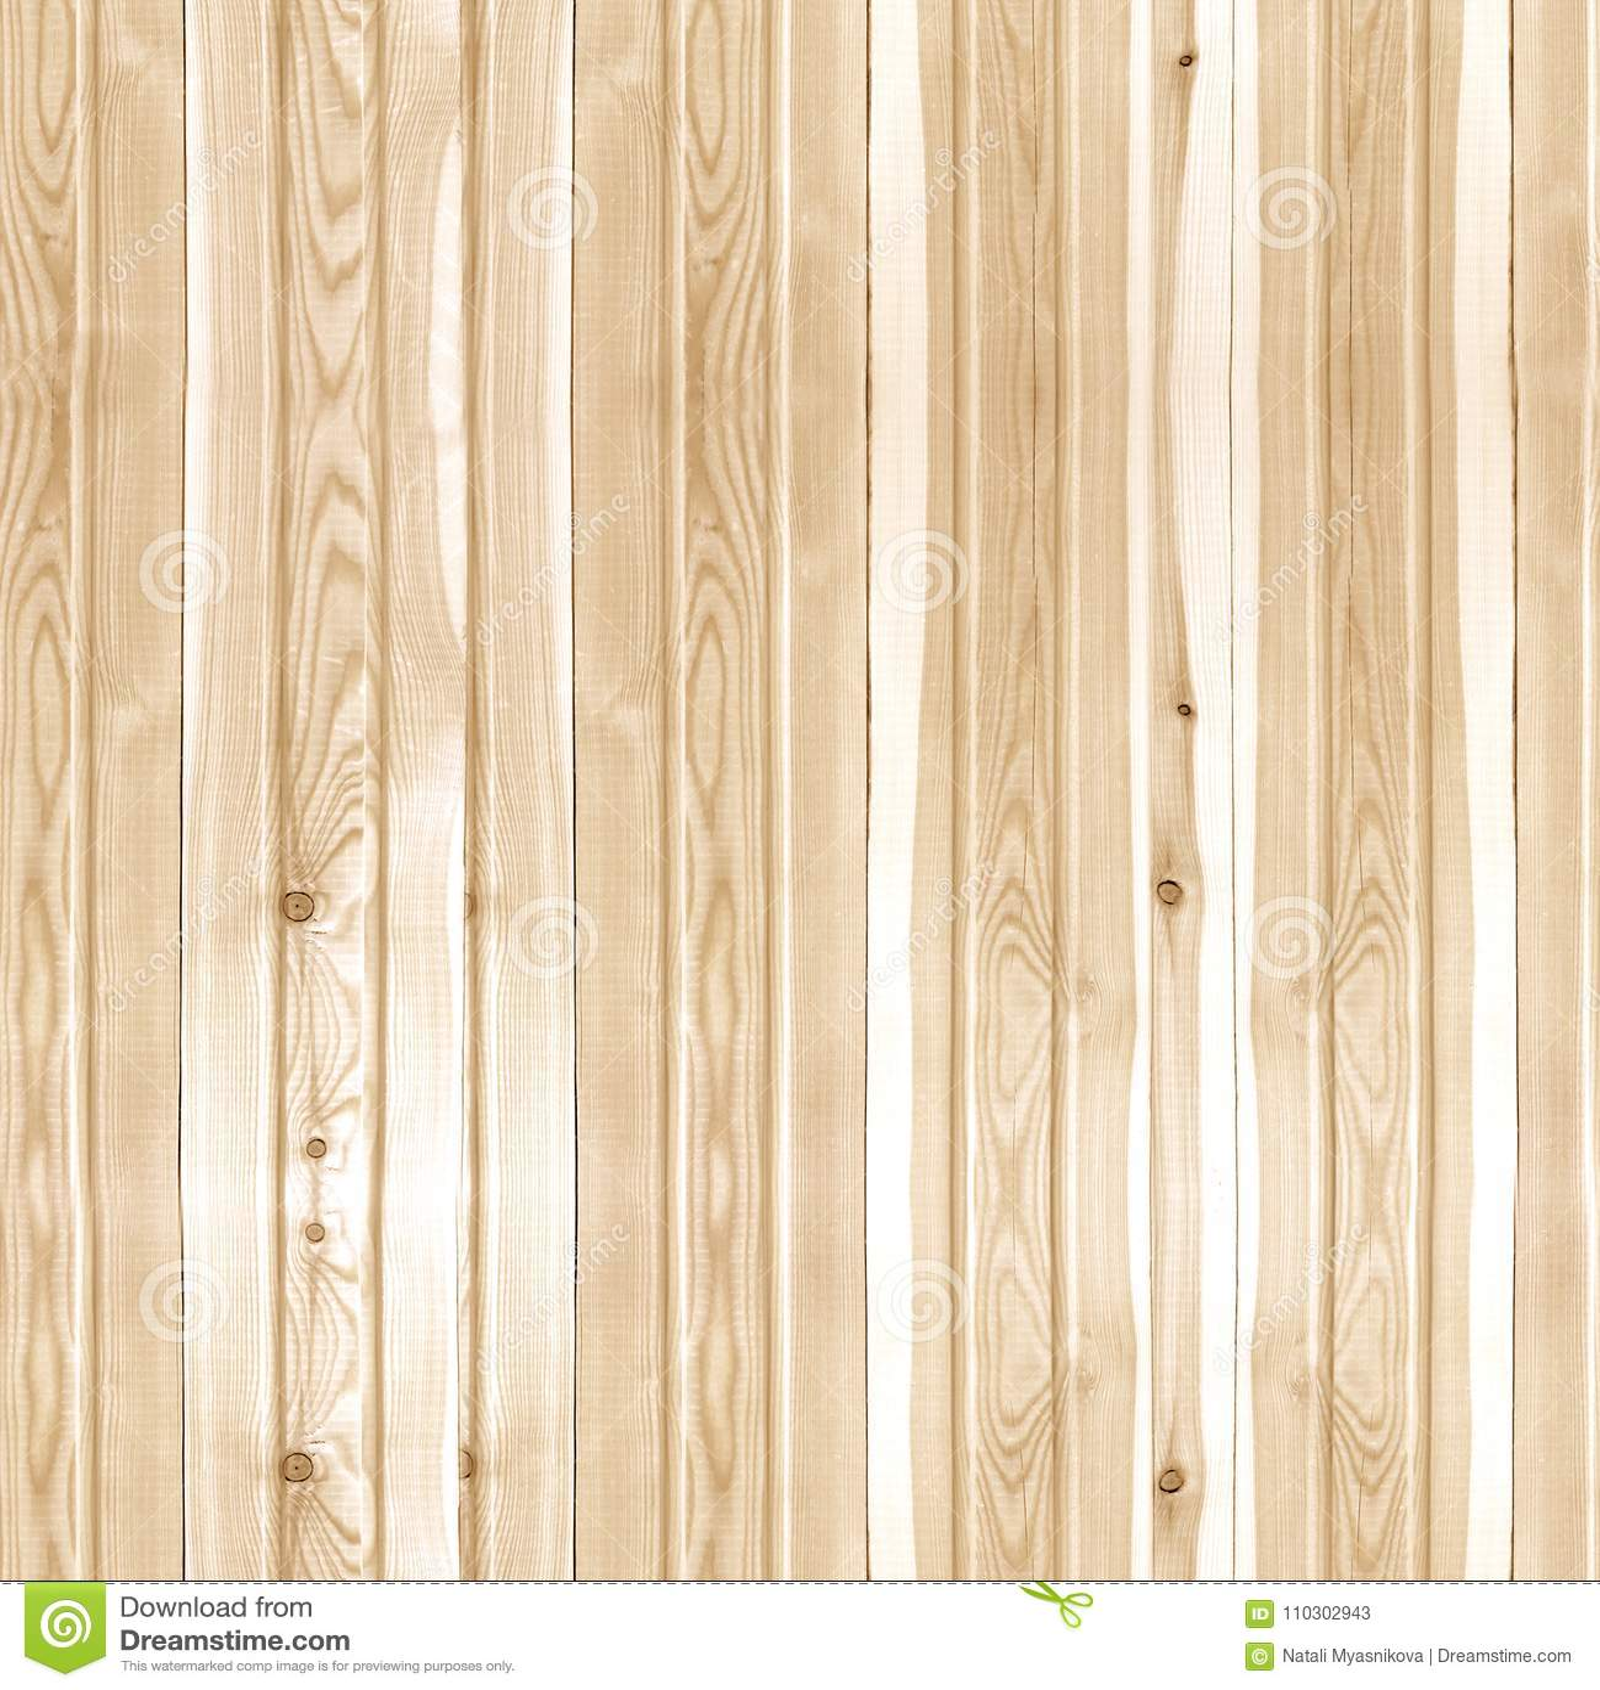 Digital Paper For Scrapbooking Light Wood Texture Seamless